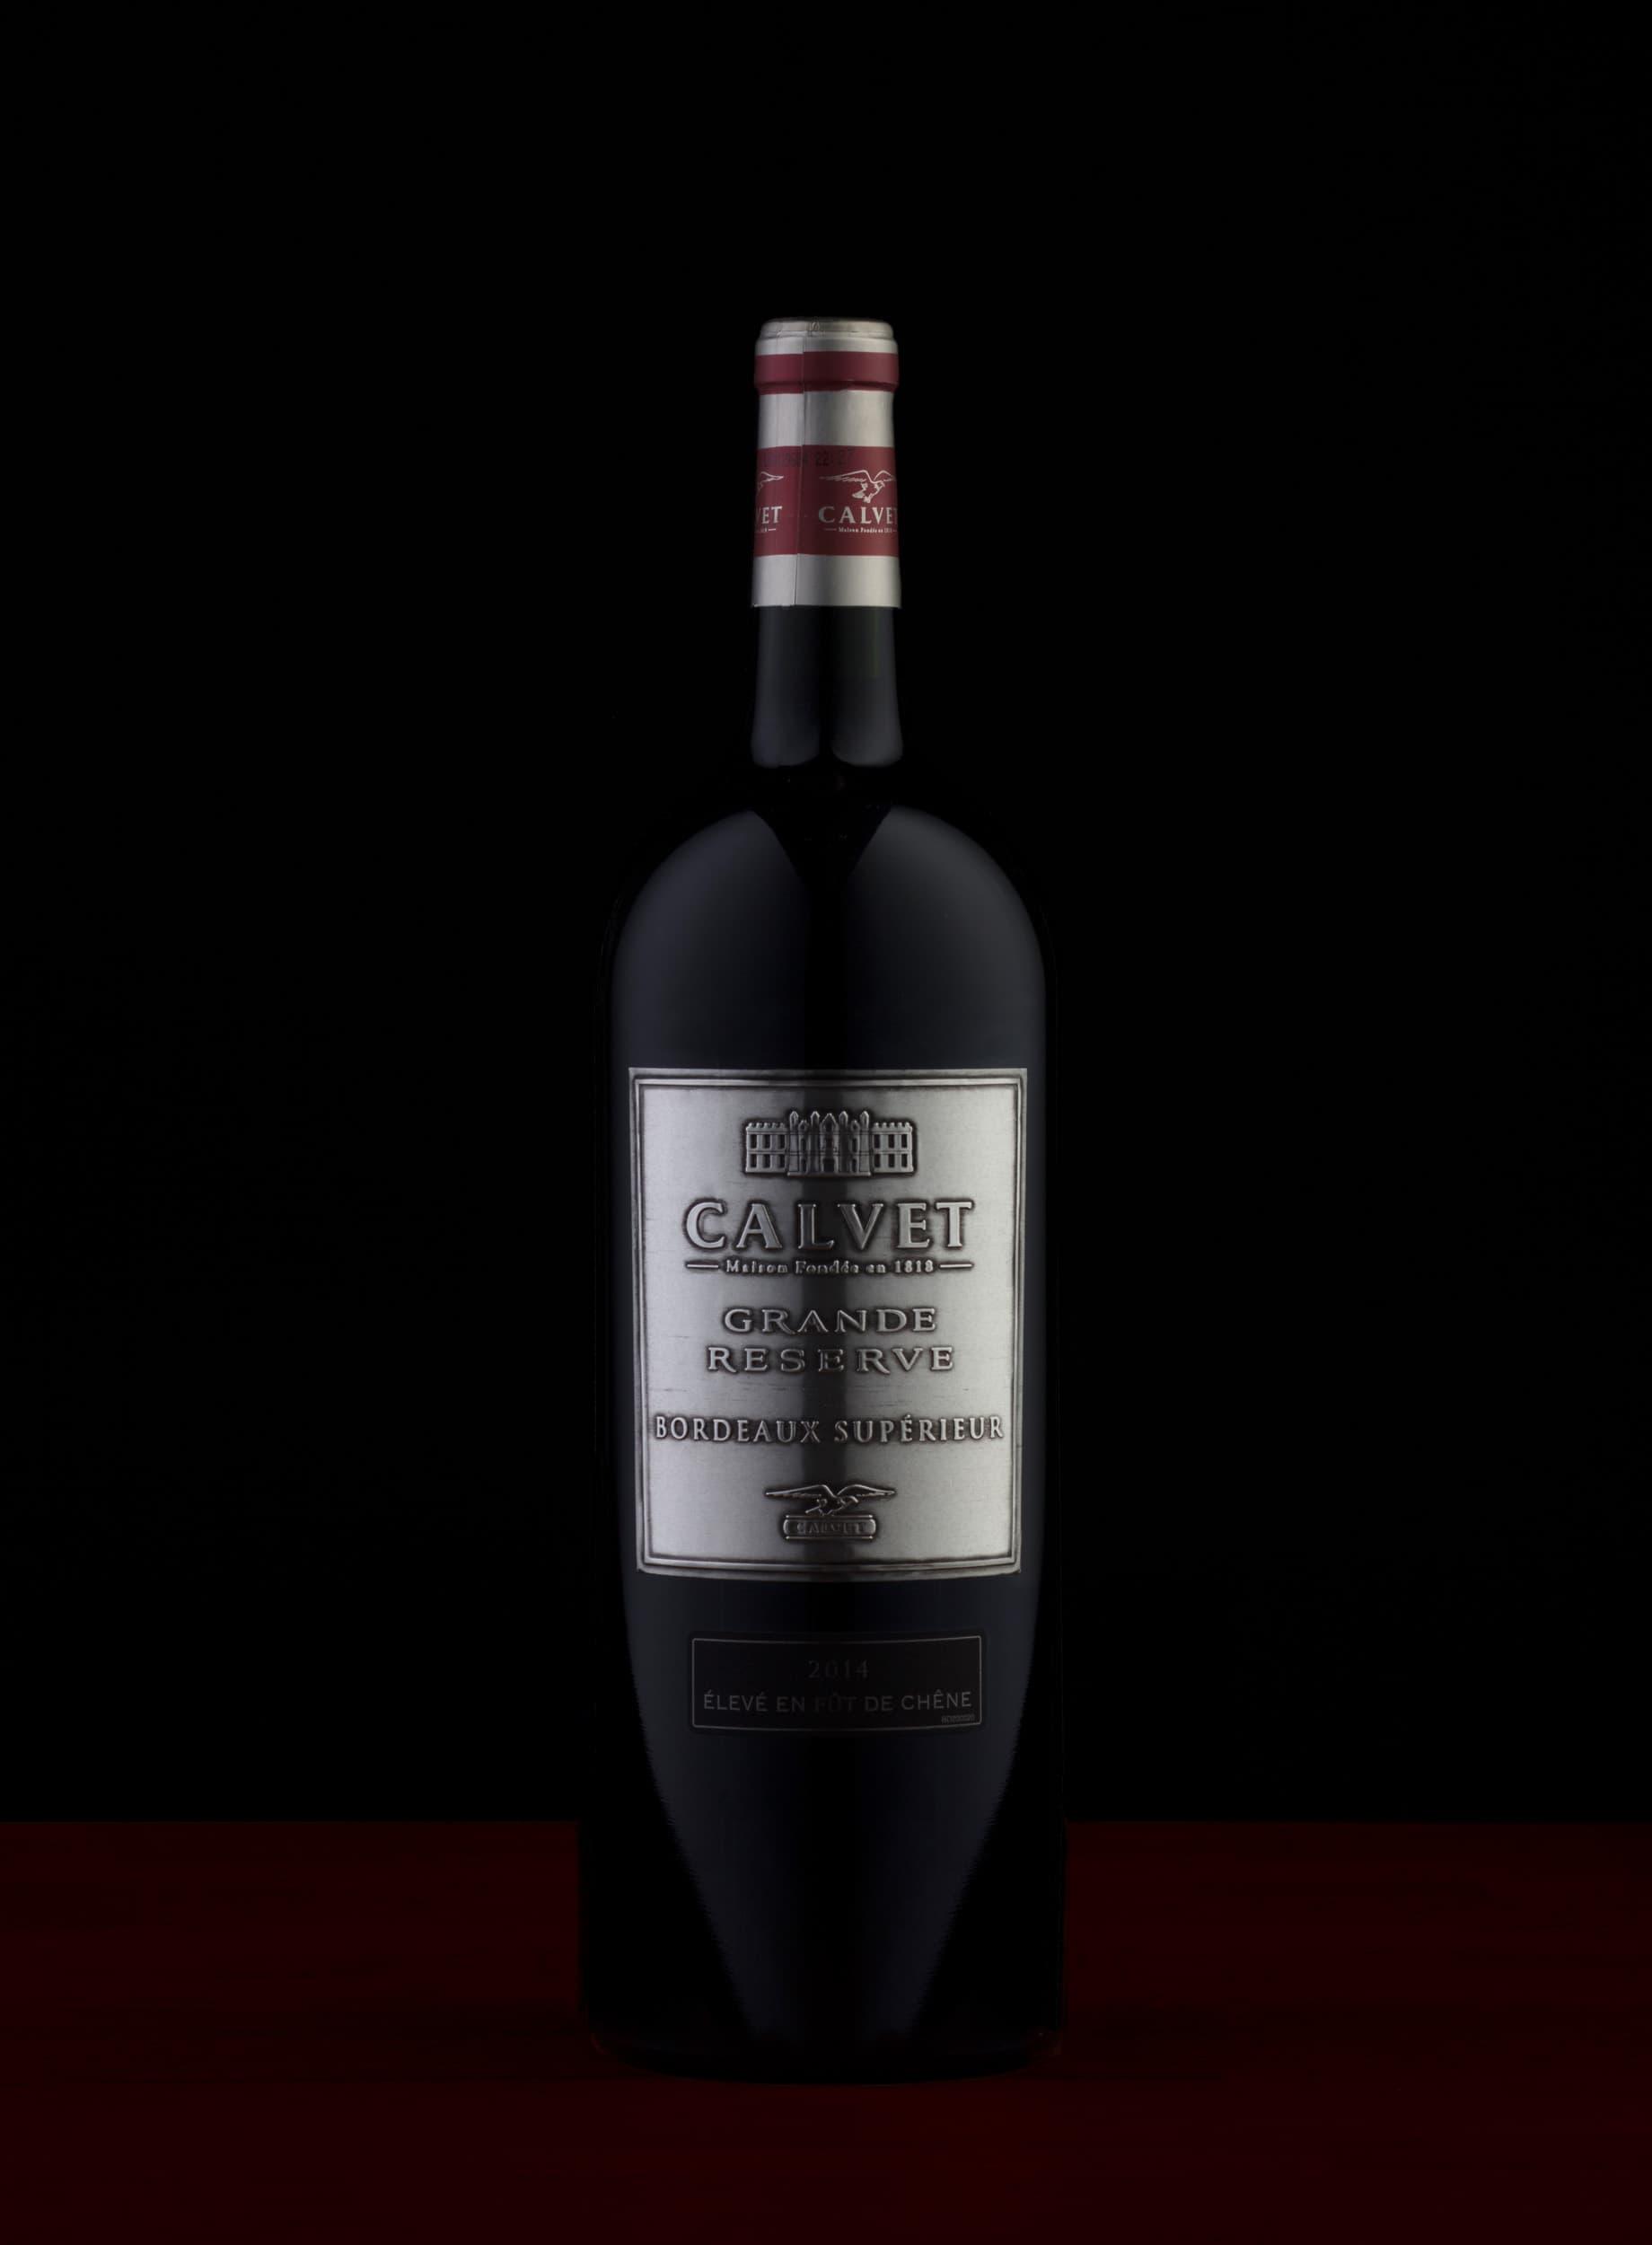 wine-calvet-2017-holgeraltgeld-original